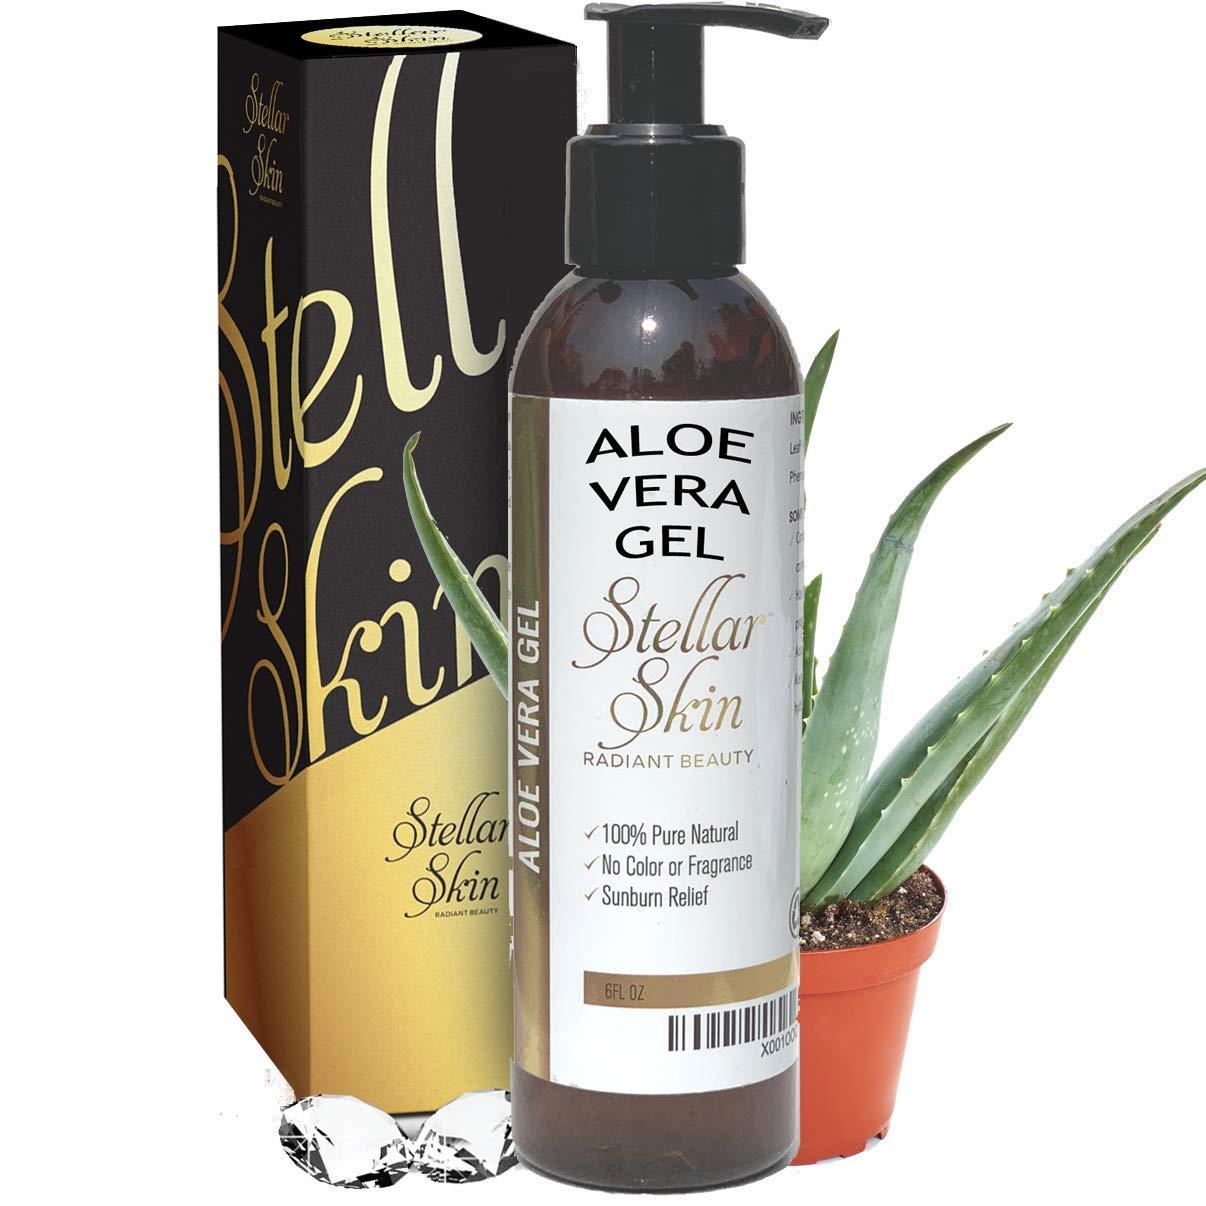 Natural Aloe Vera Gel - Organic, Perfect for Sunburn, Face, Hair, Acne, Razor Bumps, Eczema. Stellar Skin, 6 fl oz by Stellar Skin